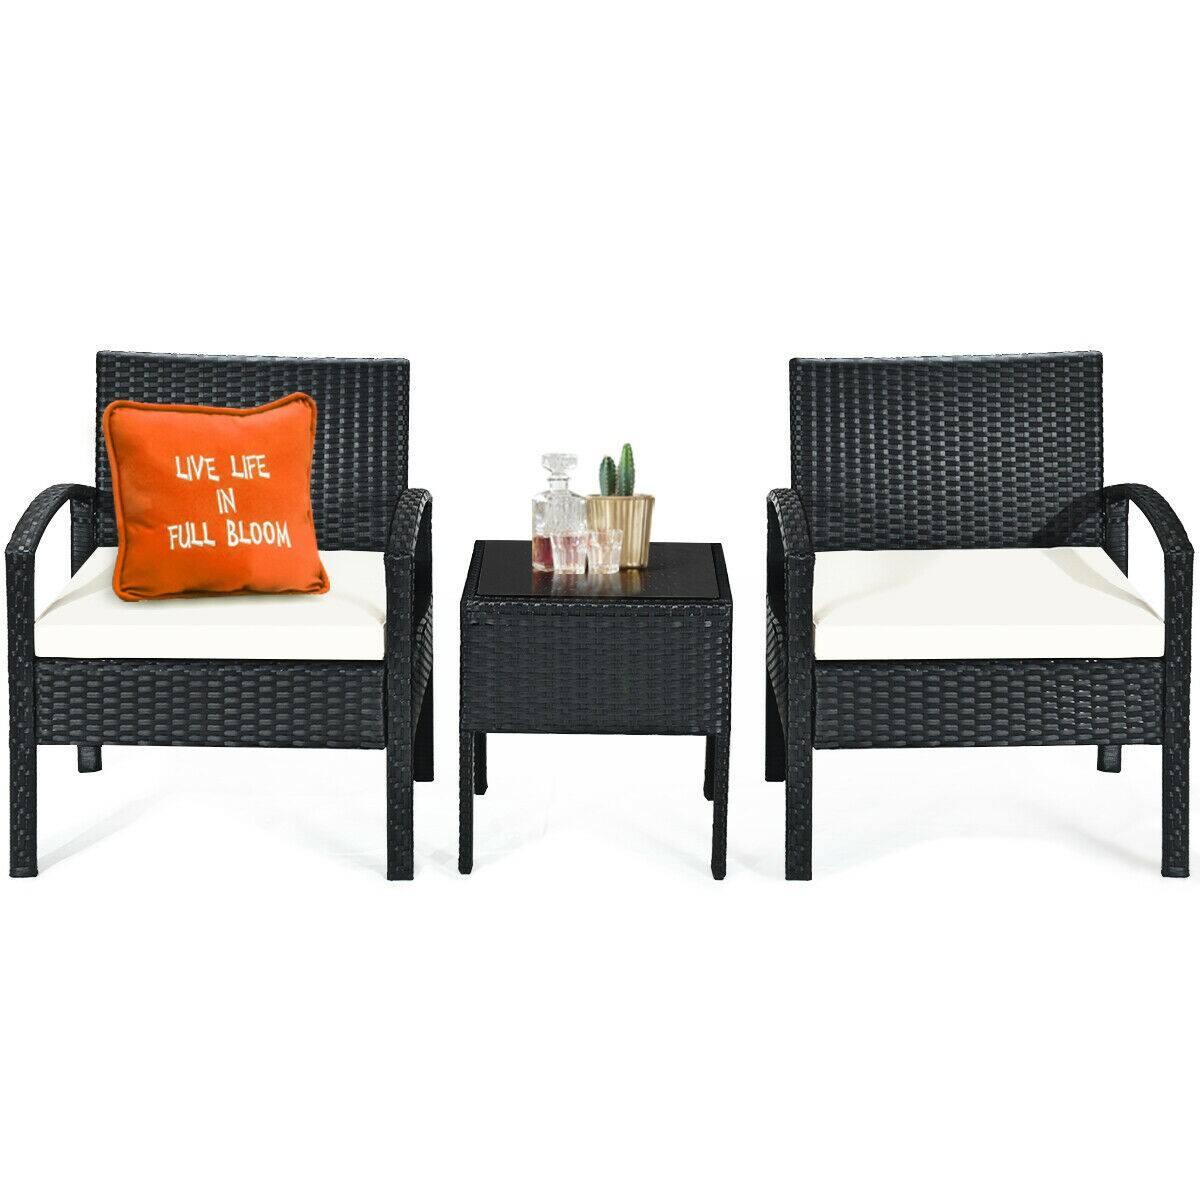 3-Piece Patio Rattan Furniture Set Sofa Cushioned Table Garden-$124.95 + Free Shipping